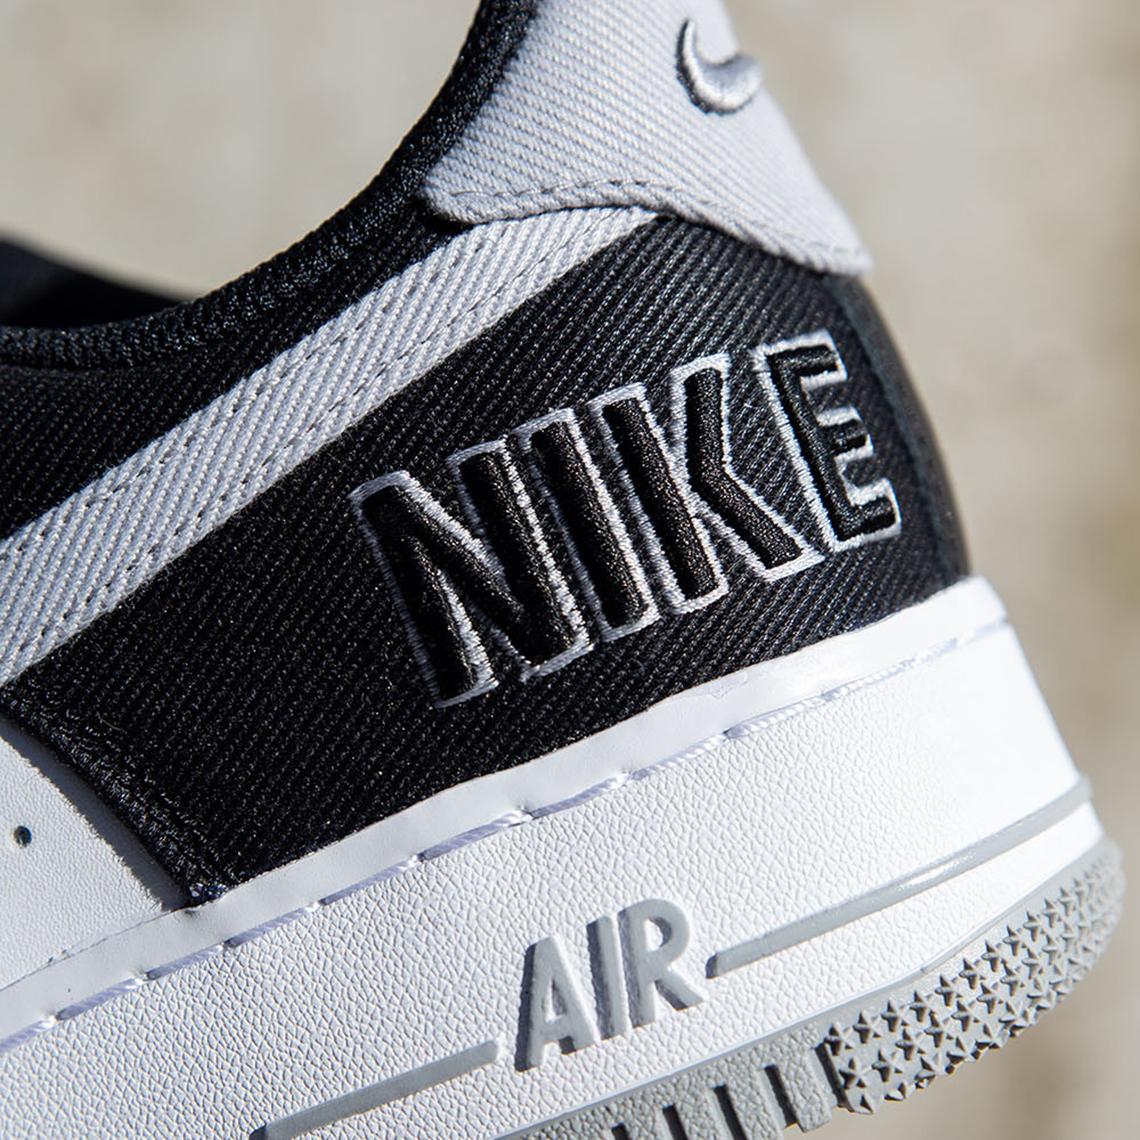 Nike Air Force 1 LV8 EMB CT2301-001 Release Date | SneakerNews.com